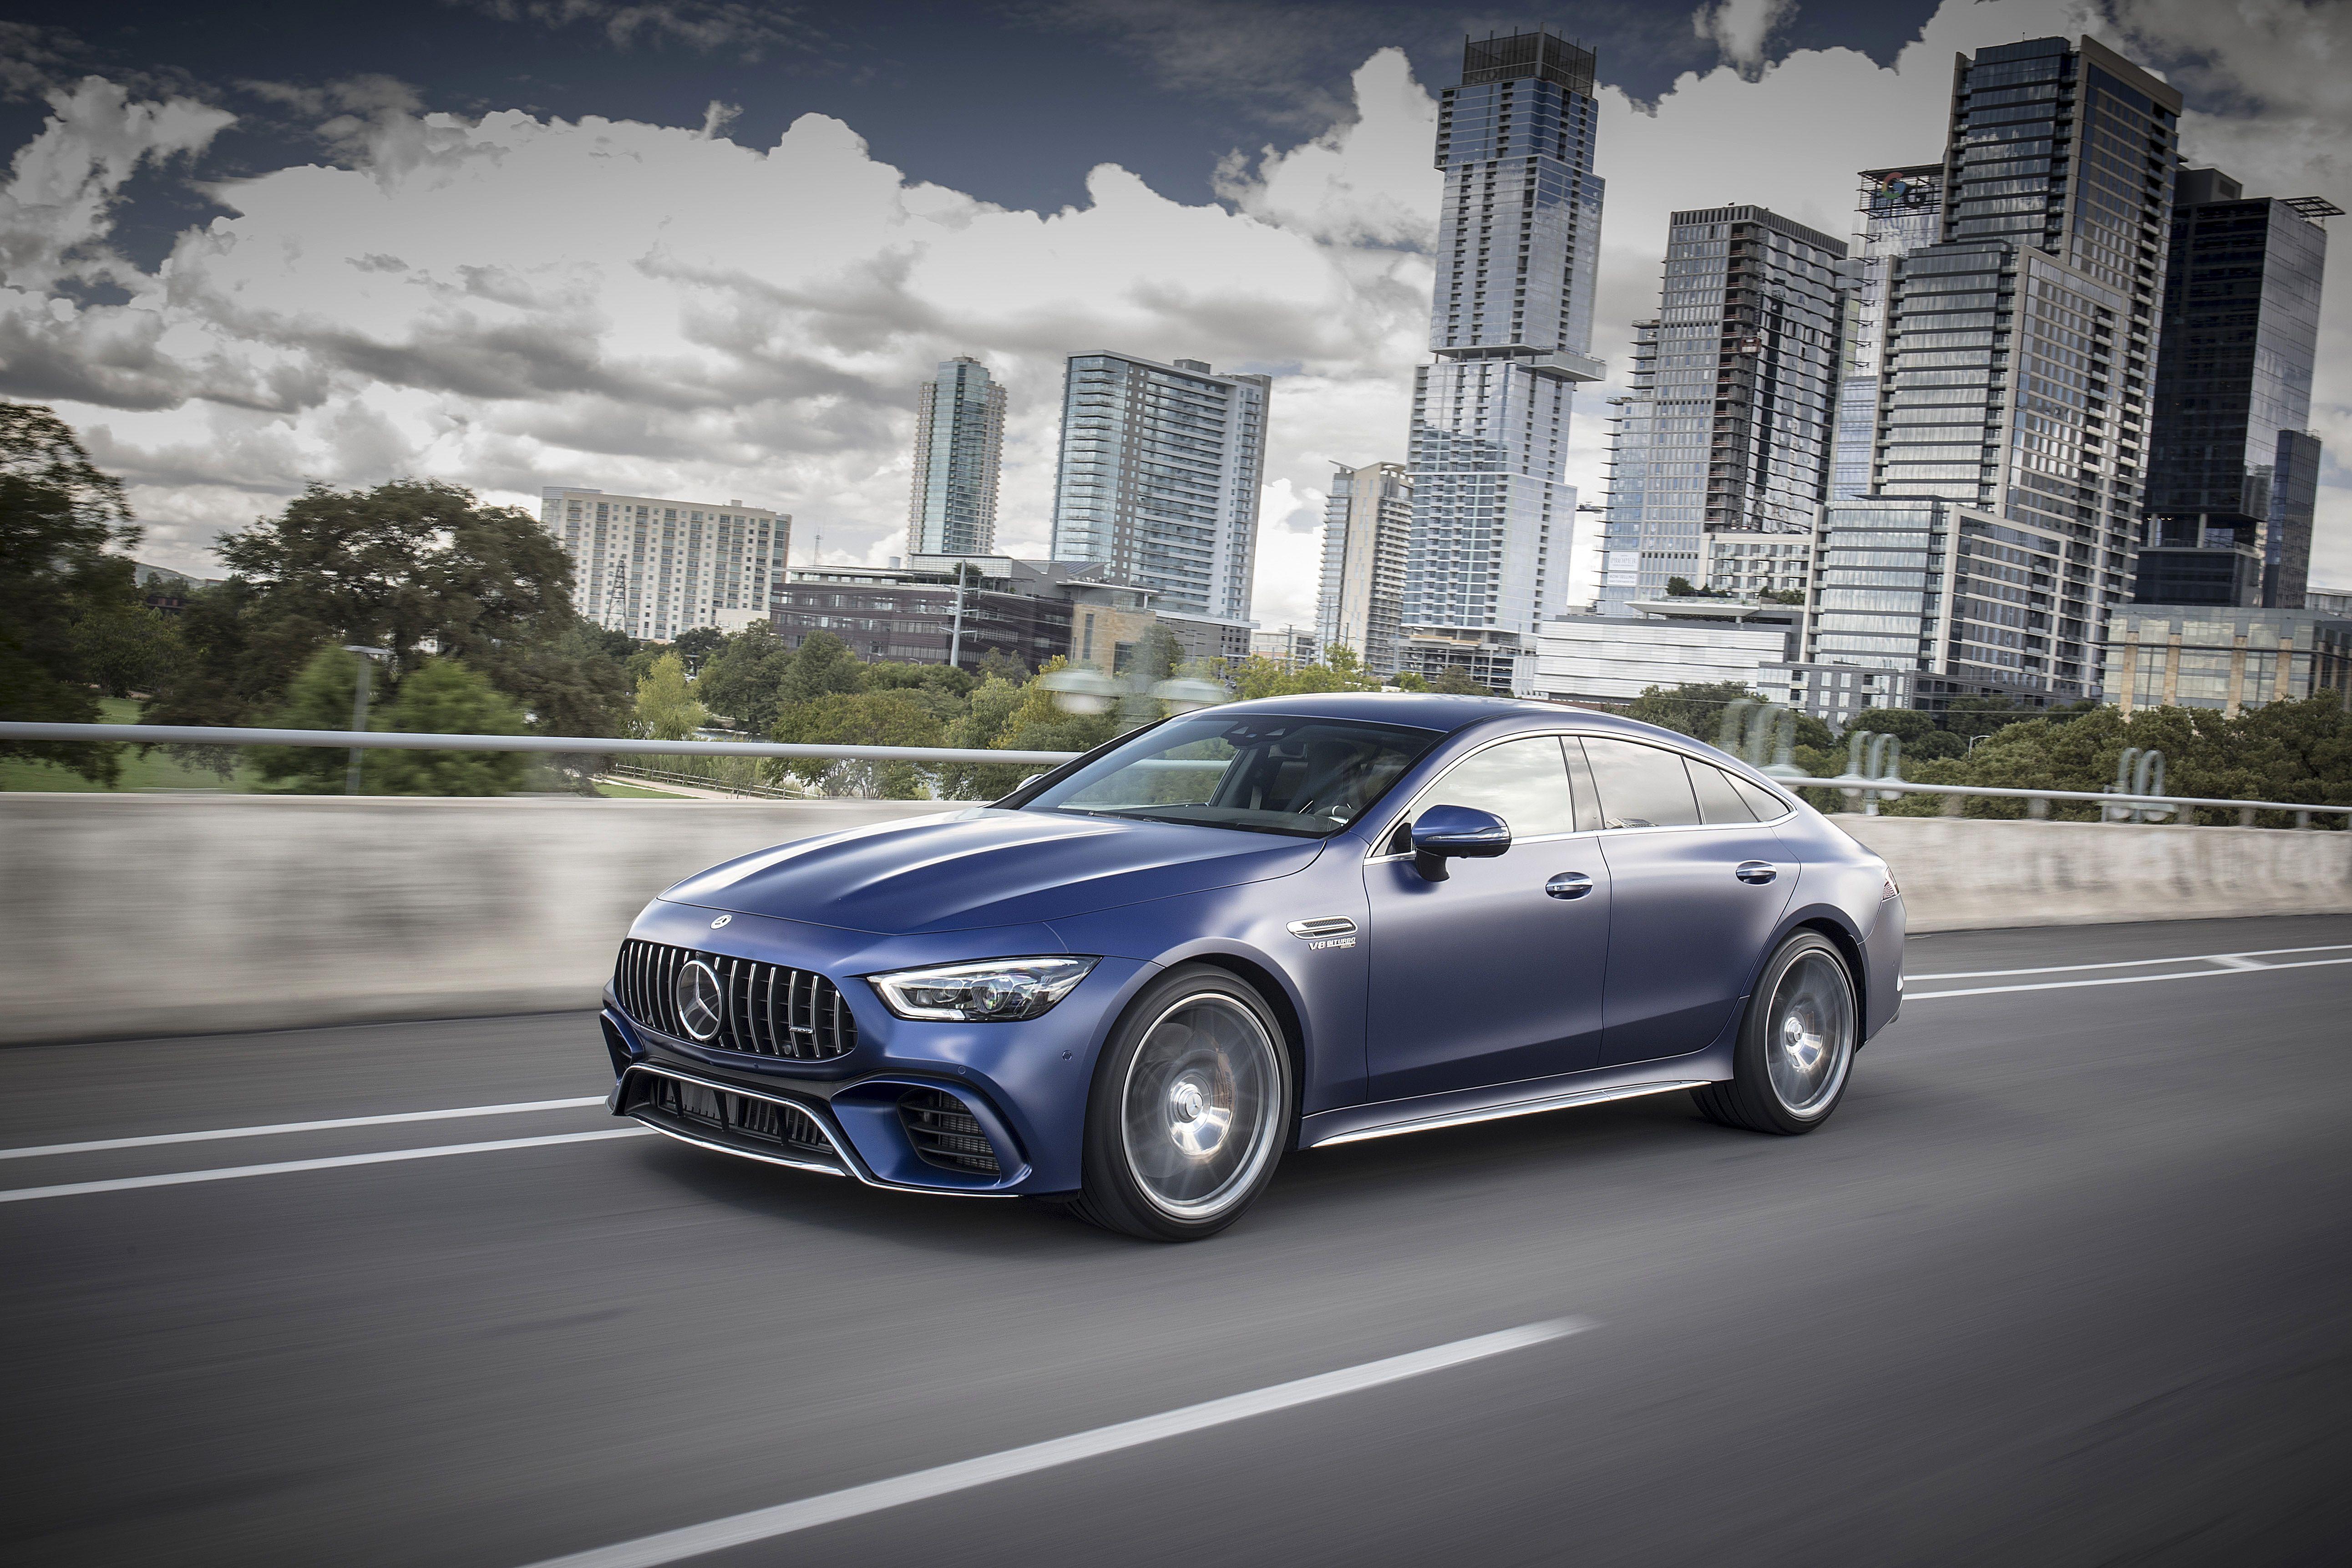 Pin by Elite Traveler on Luxury Transportation Mercedes